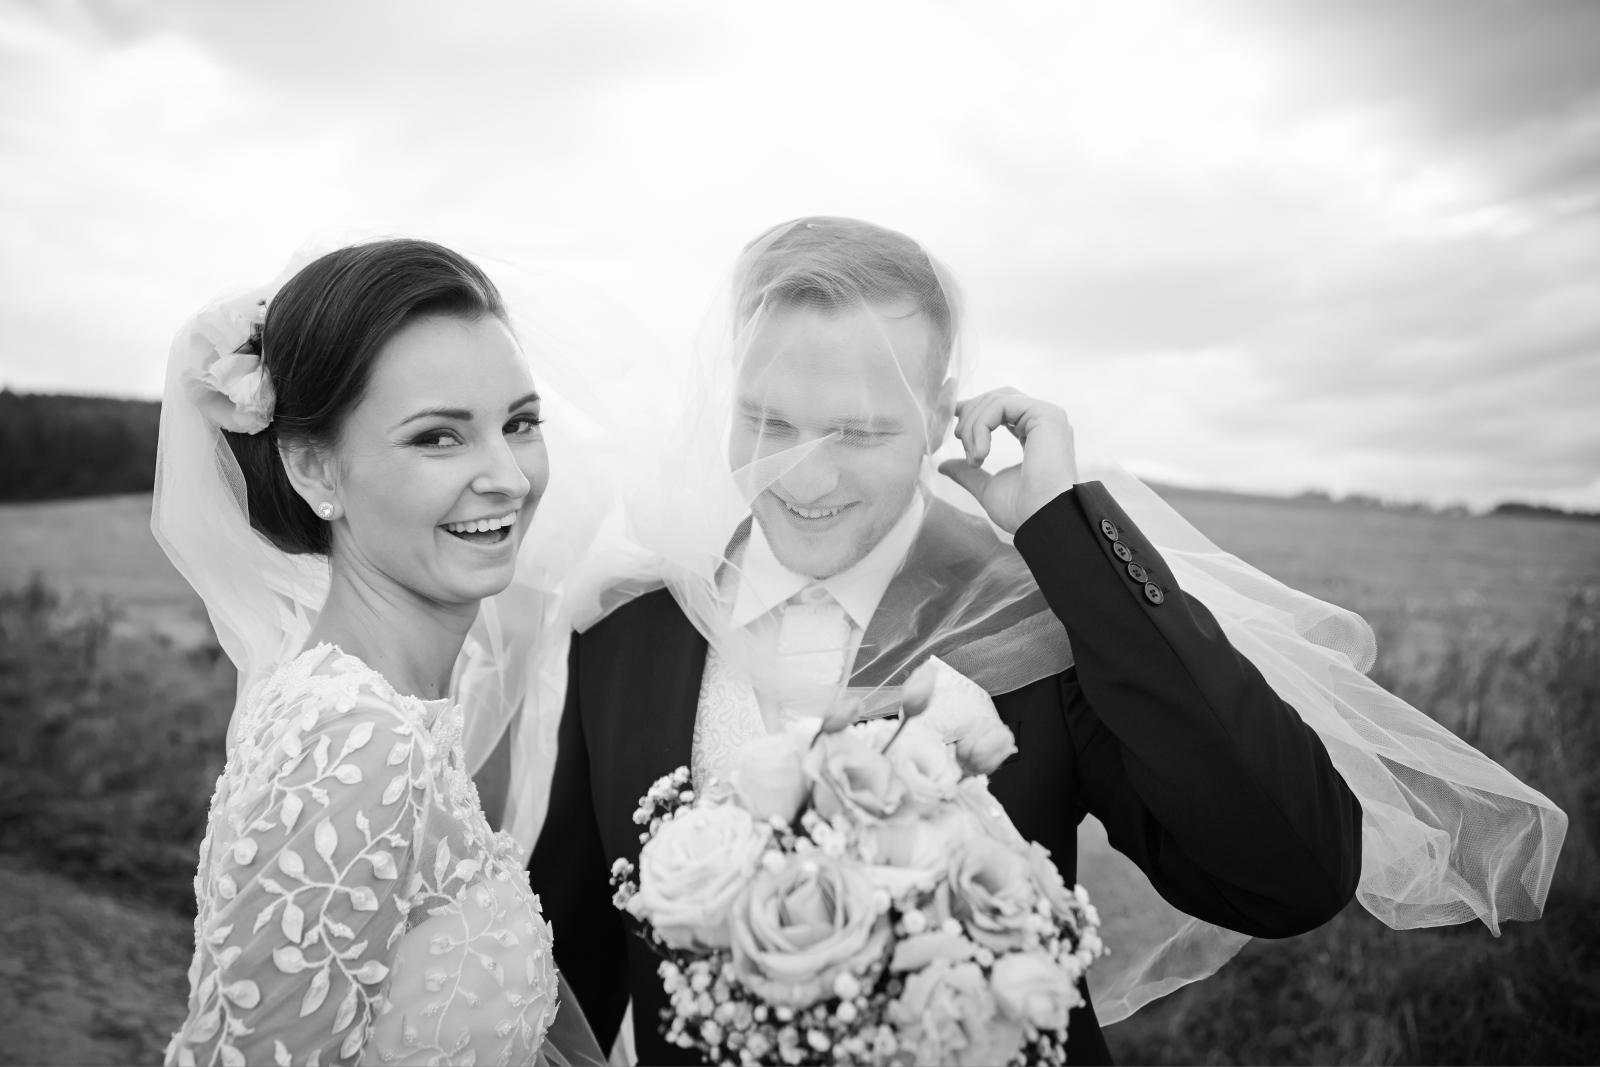 Svadba M+M - Obrázok č. 13